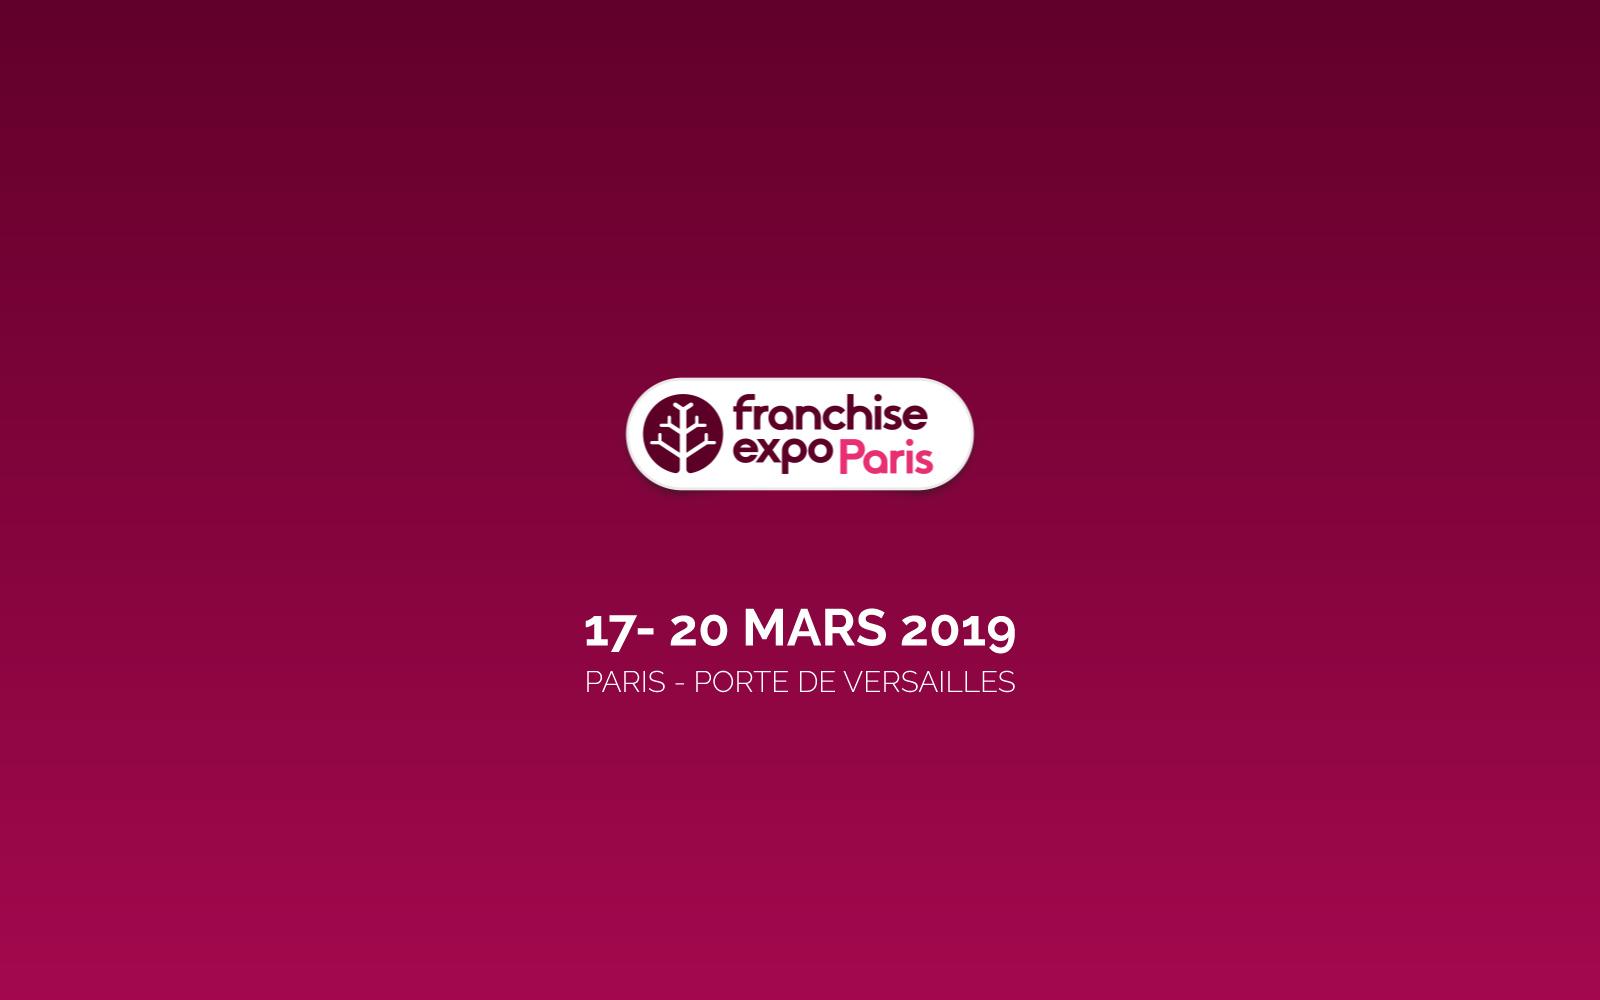 franchise-expo-2019